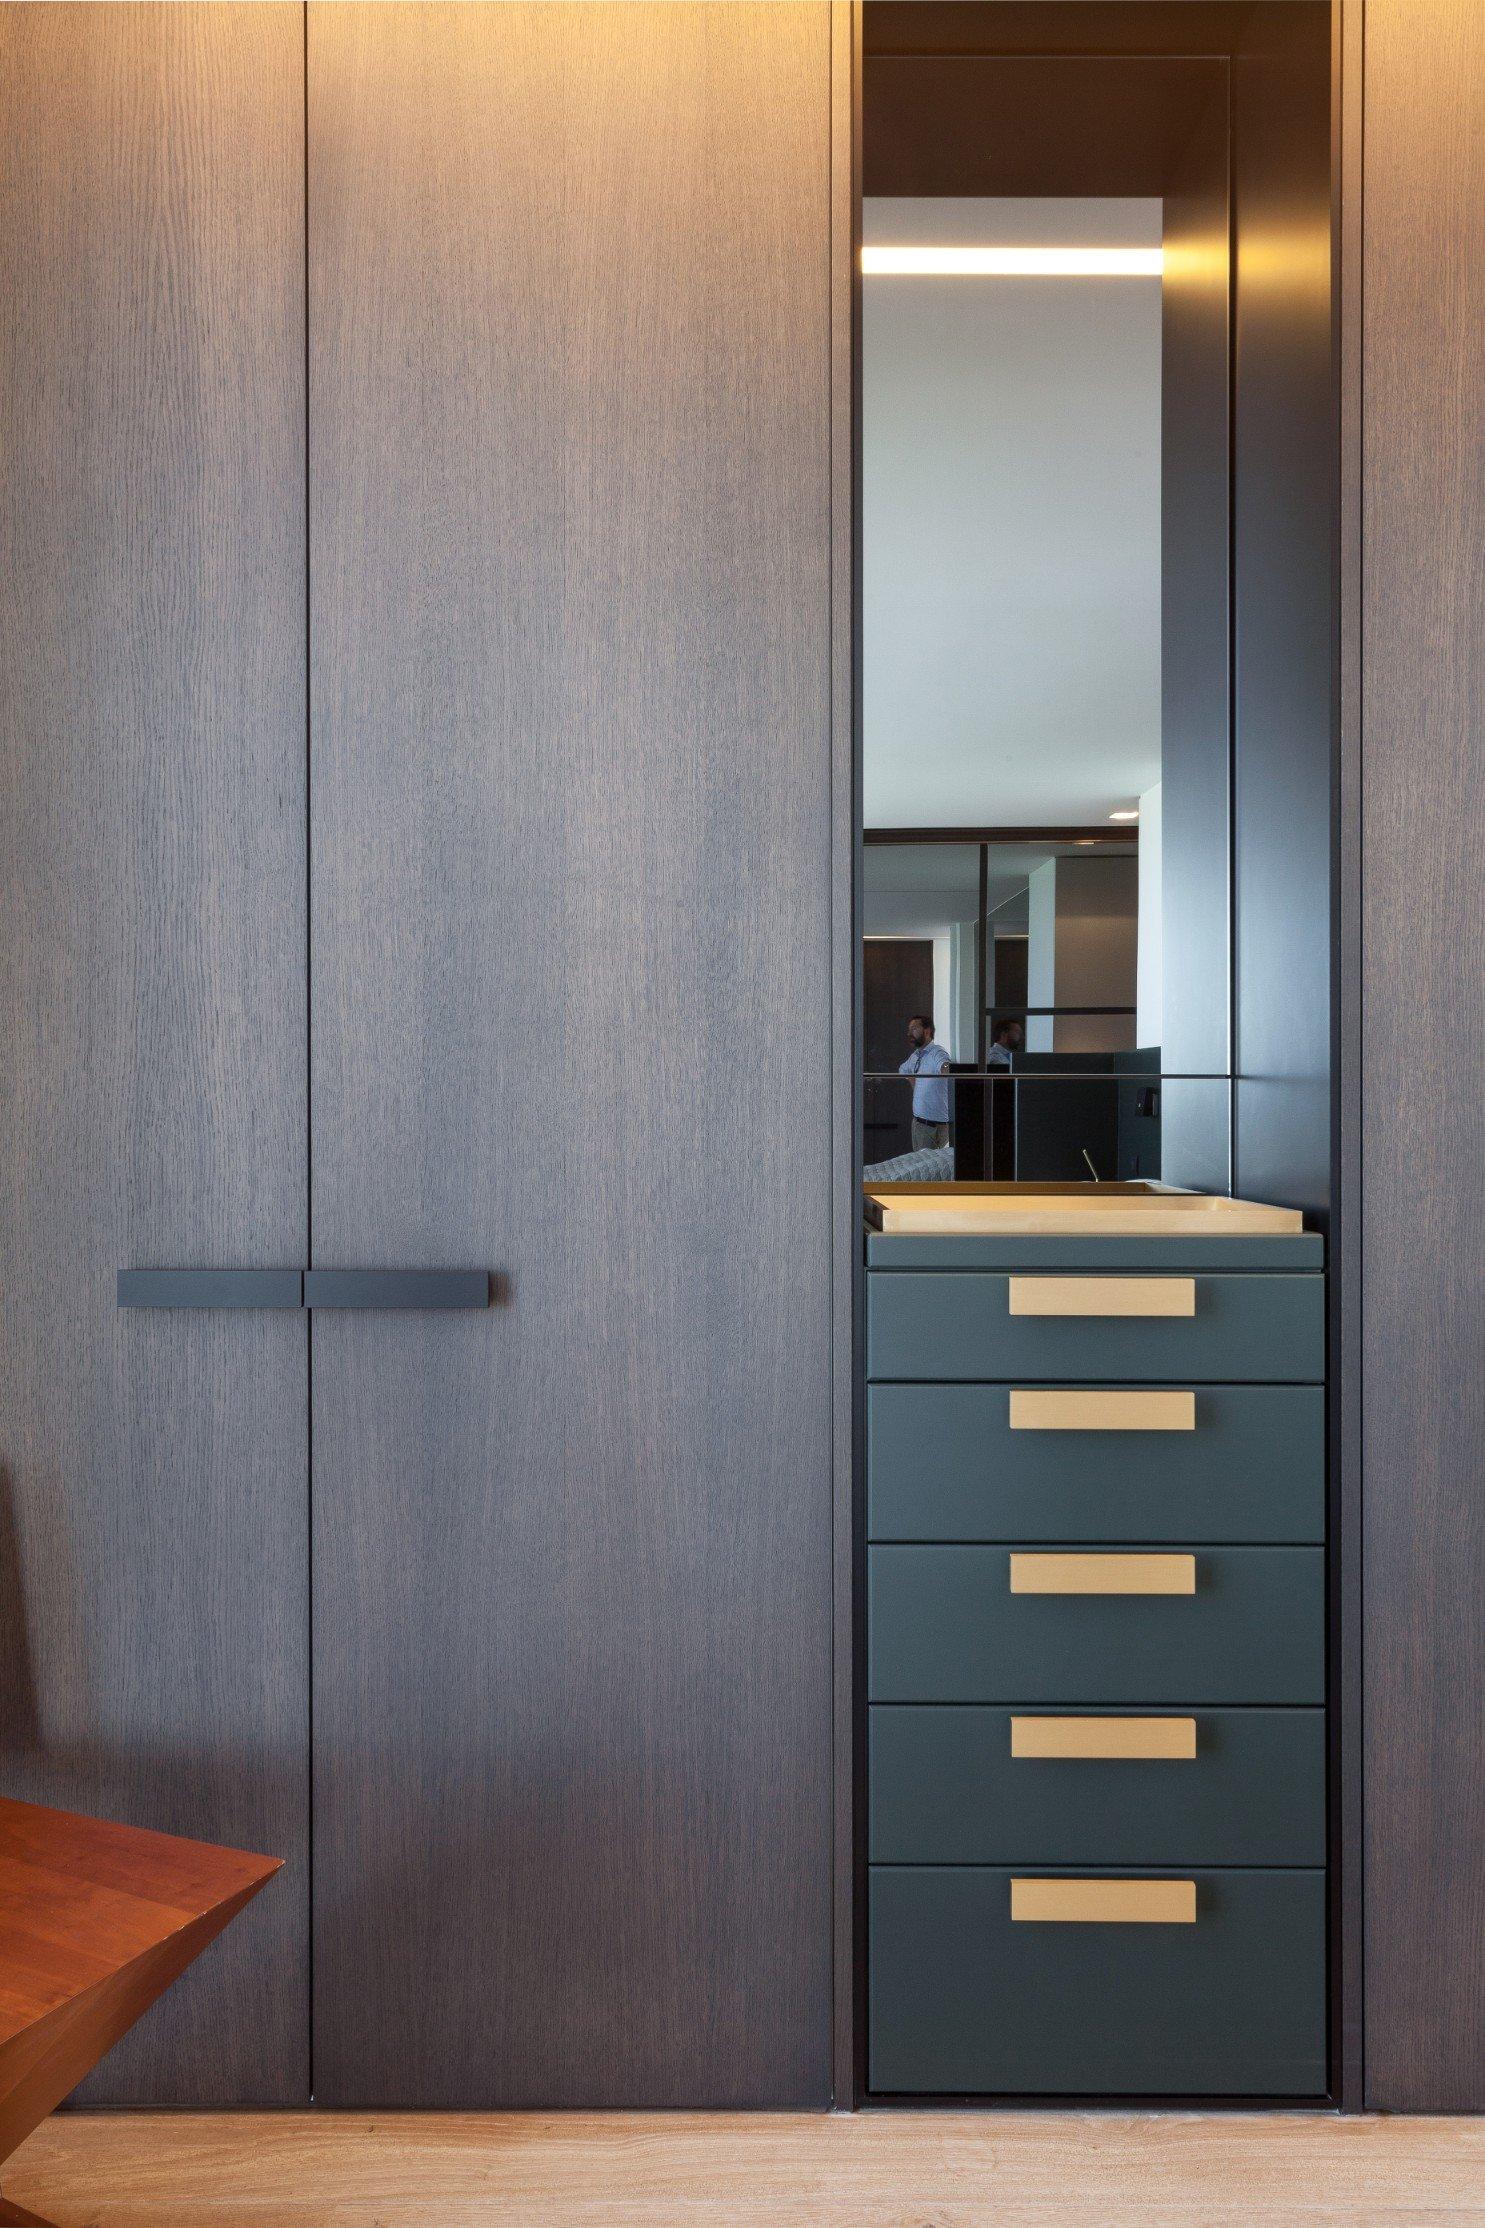 Rietveldprojects-penthouse-appartement-design-architectuur-kust7